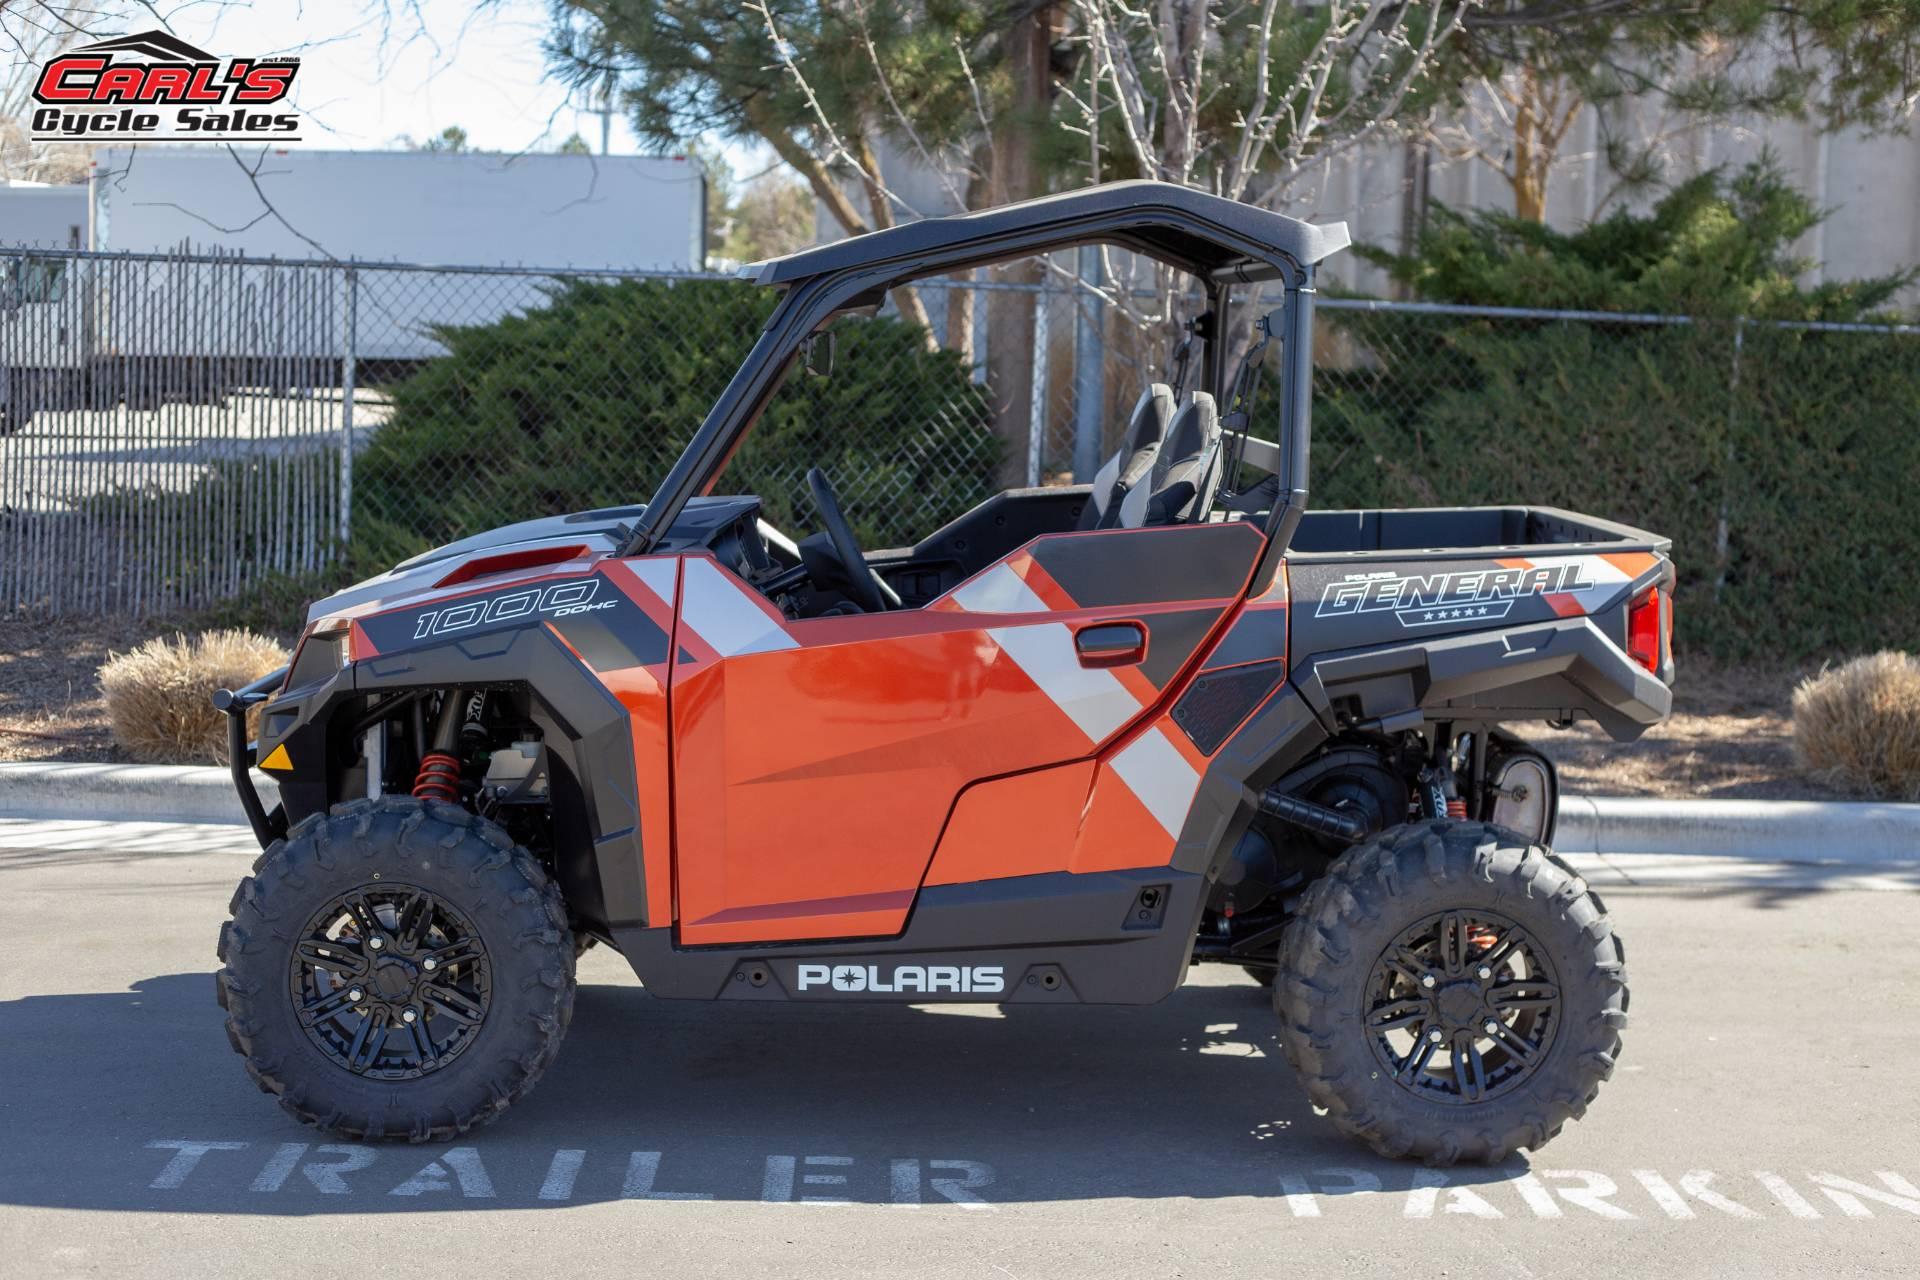 Polaris General 1000 >> New 2019 Polaris General 1000 Eps Deluxe Utility Vehicles In Boise